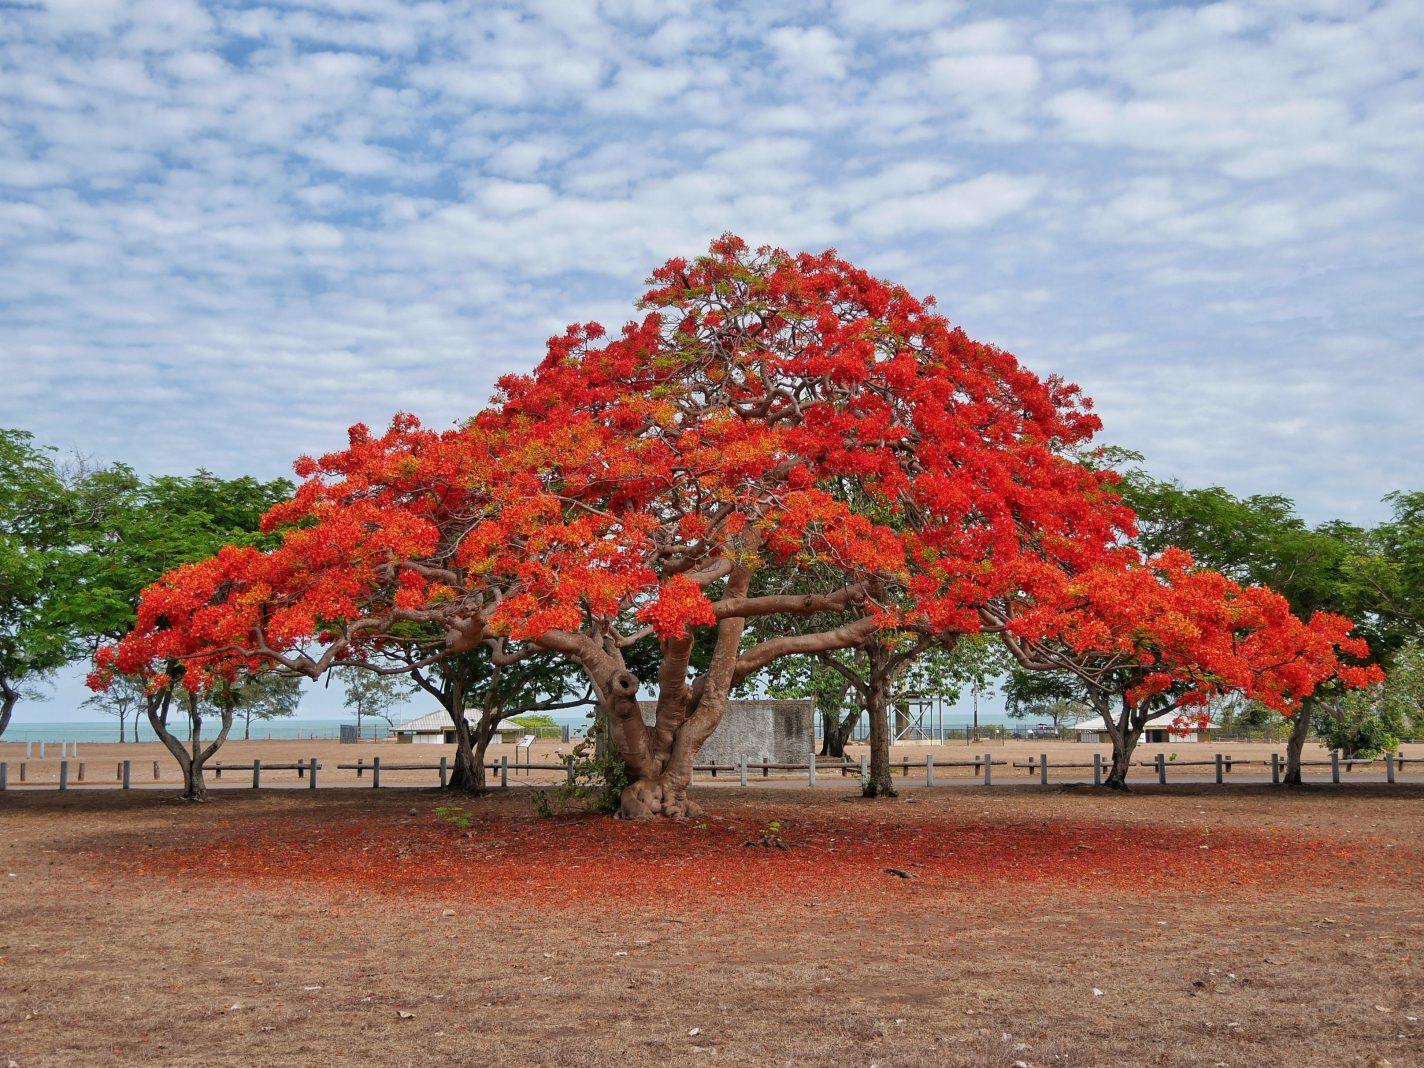 In november staan de bomen in bloei in Darwin - Wet season komt eraan